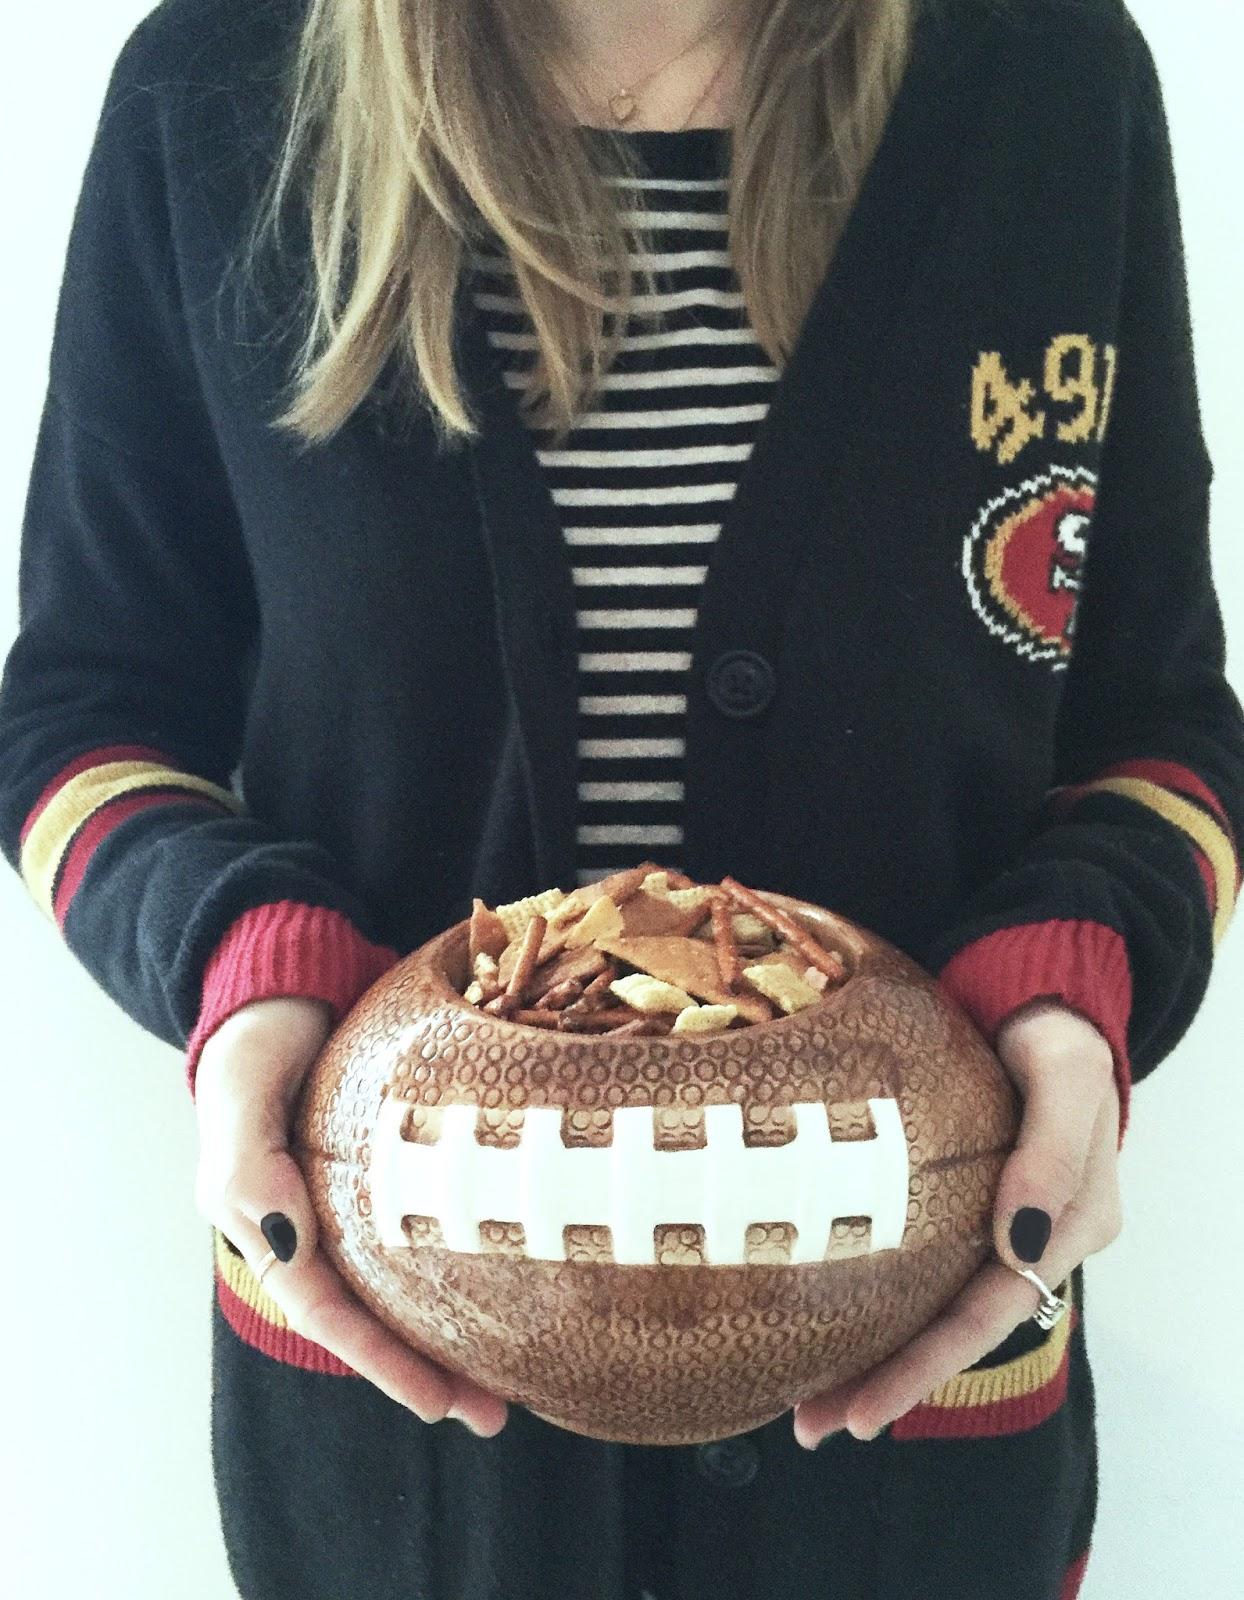 Super Bowl Party Chex Mix